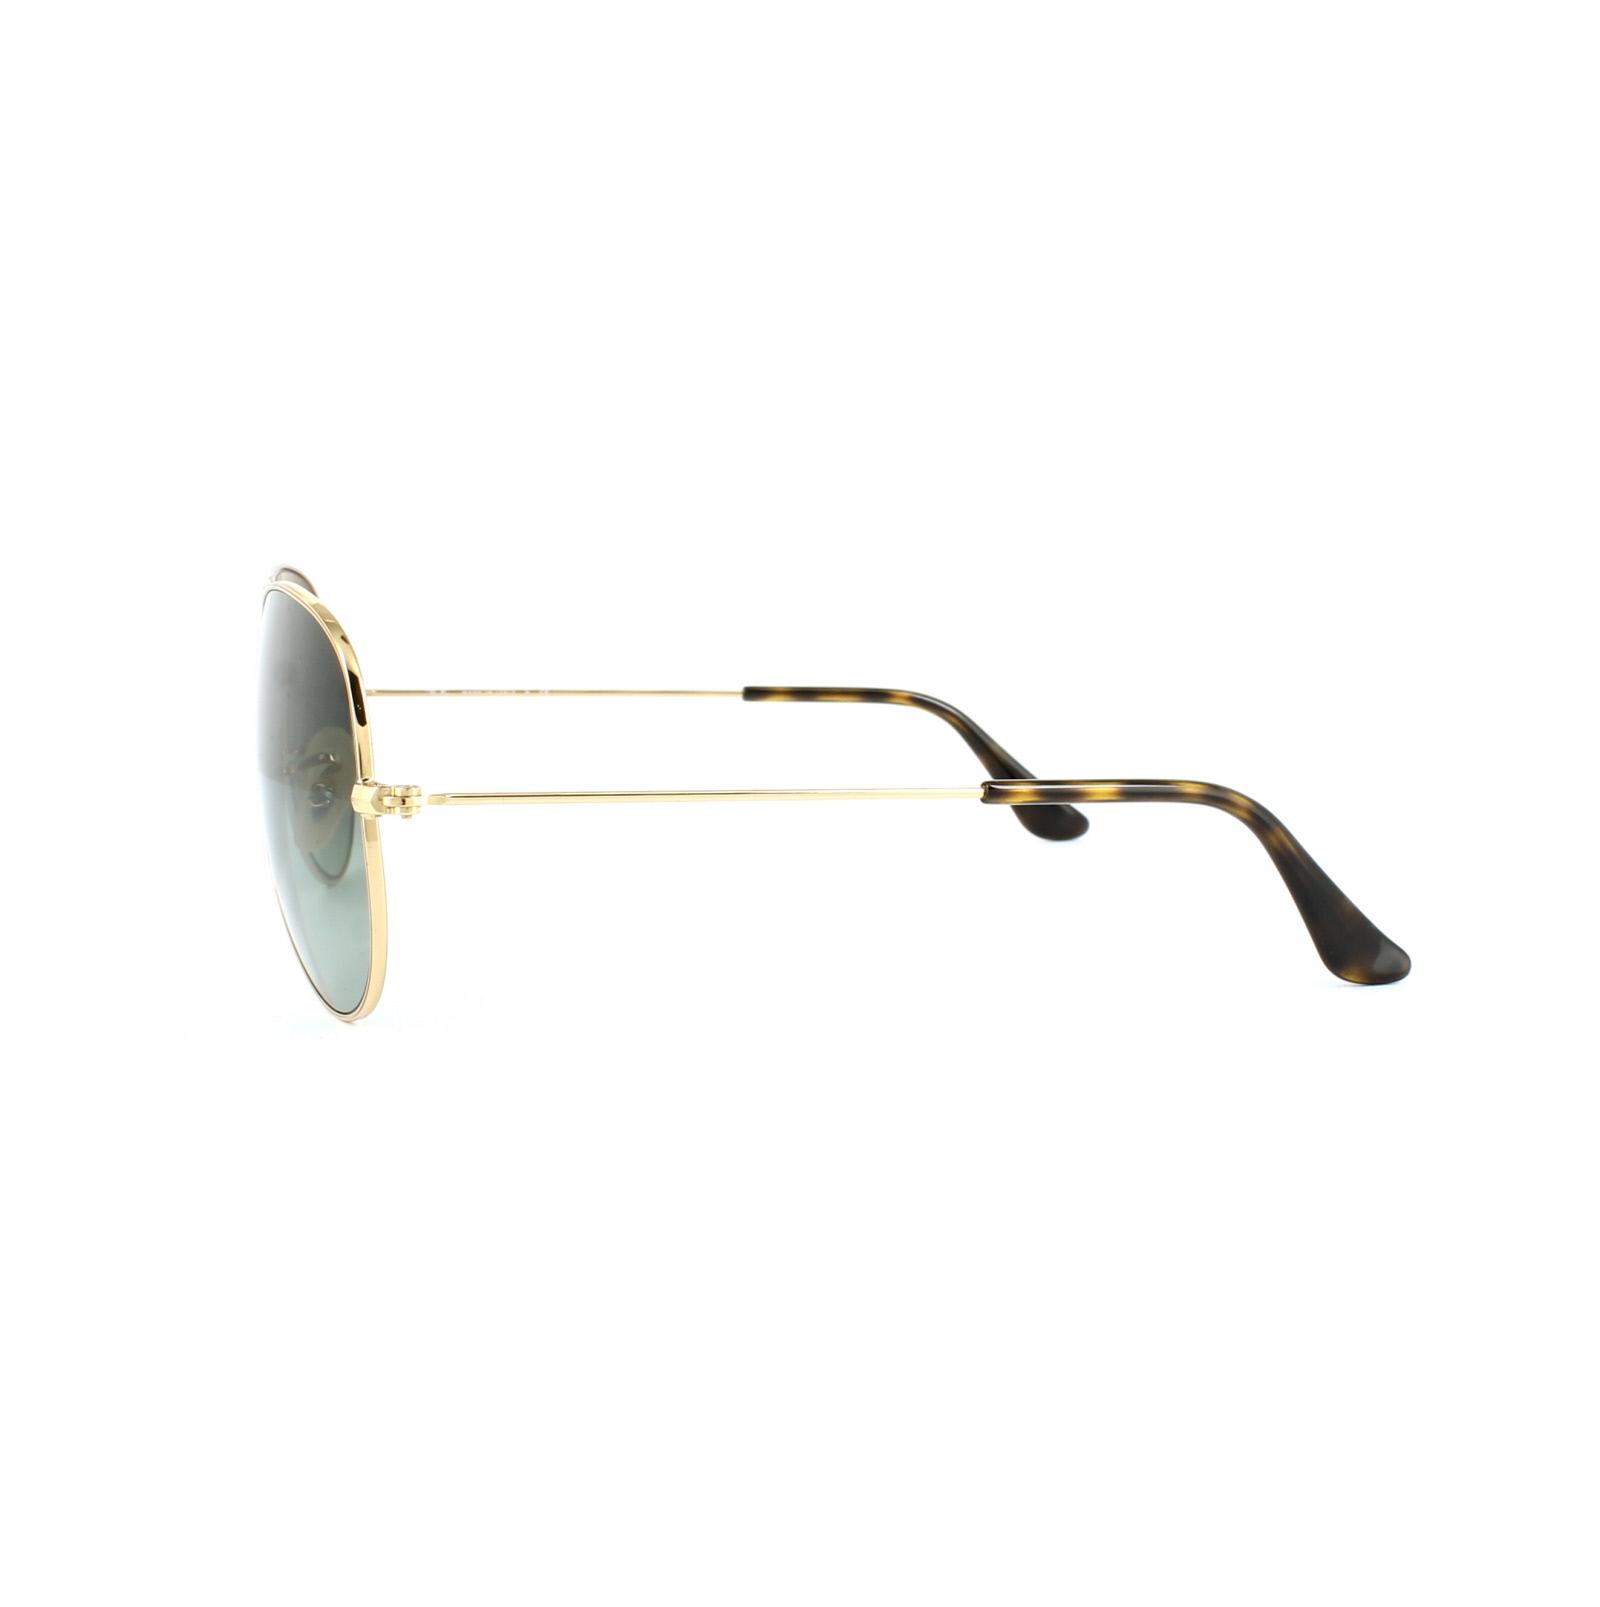 d401f37187 Sentinel Ray-Ban Sunglasses Aviator 3025 181 71 Gold   Havana Grey Gradient